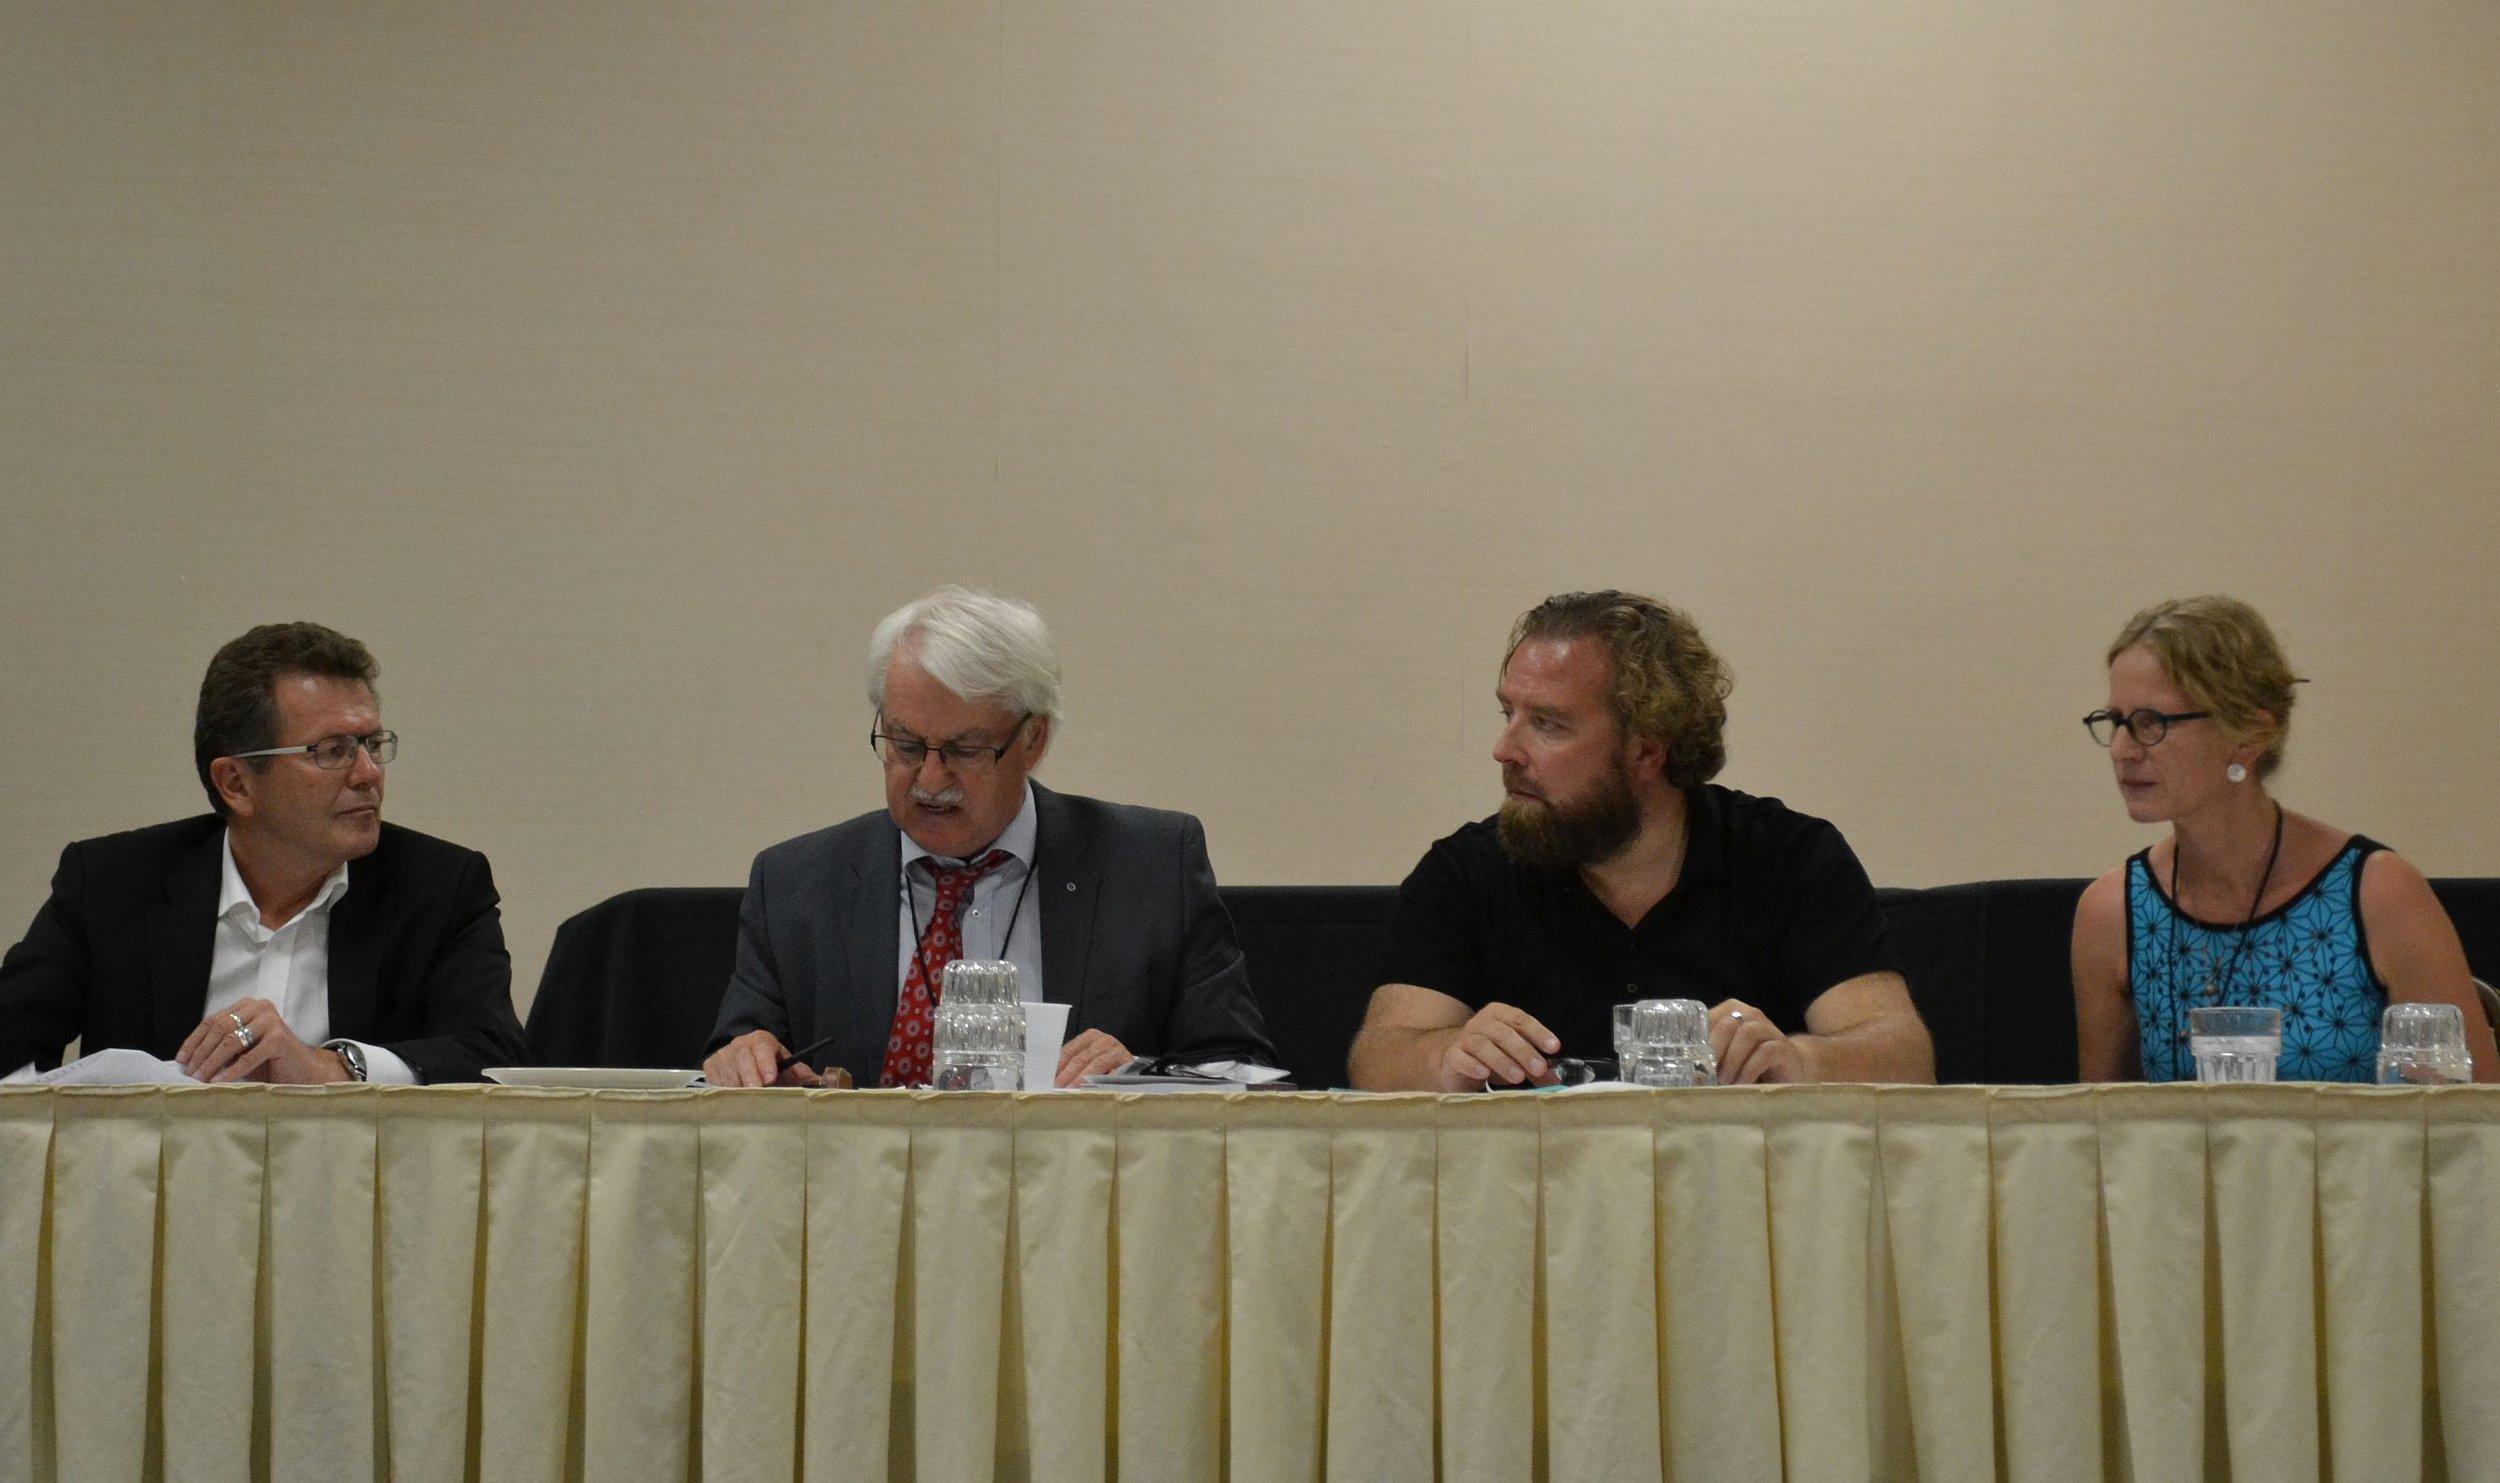 From left: Ambassador Waldner, Professor Bischof, Professor Rupnow,Dr. Hintermann